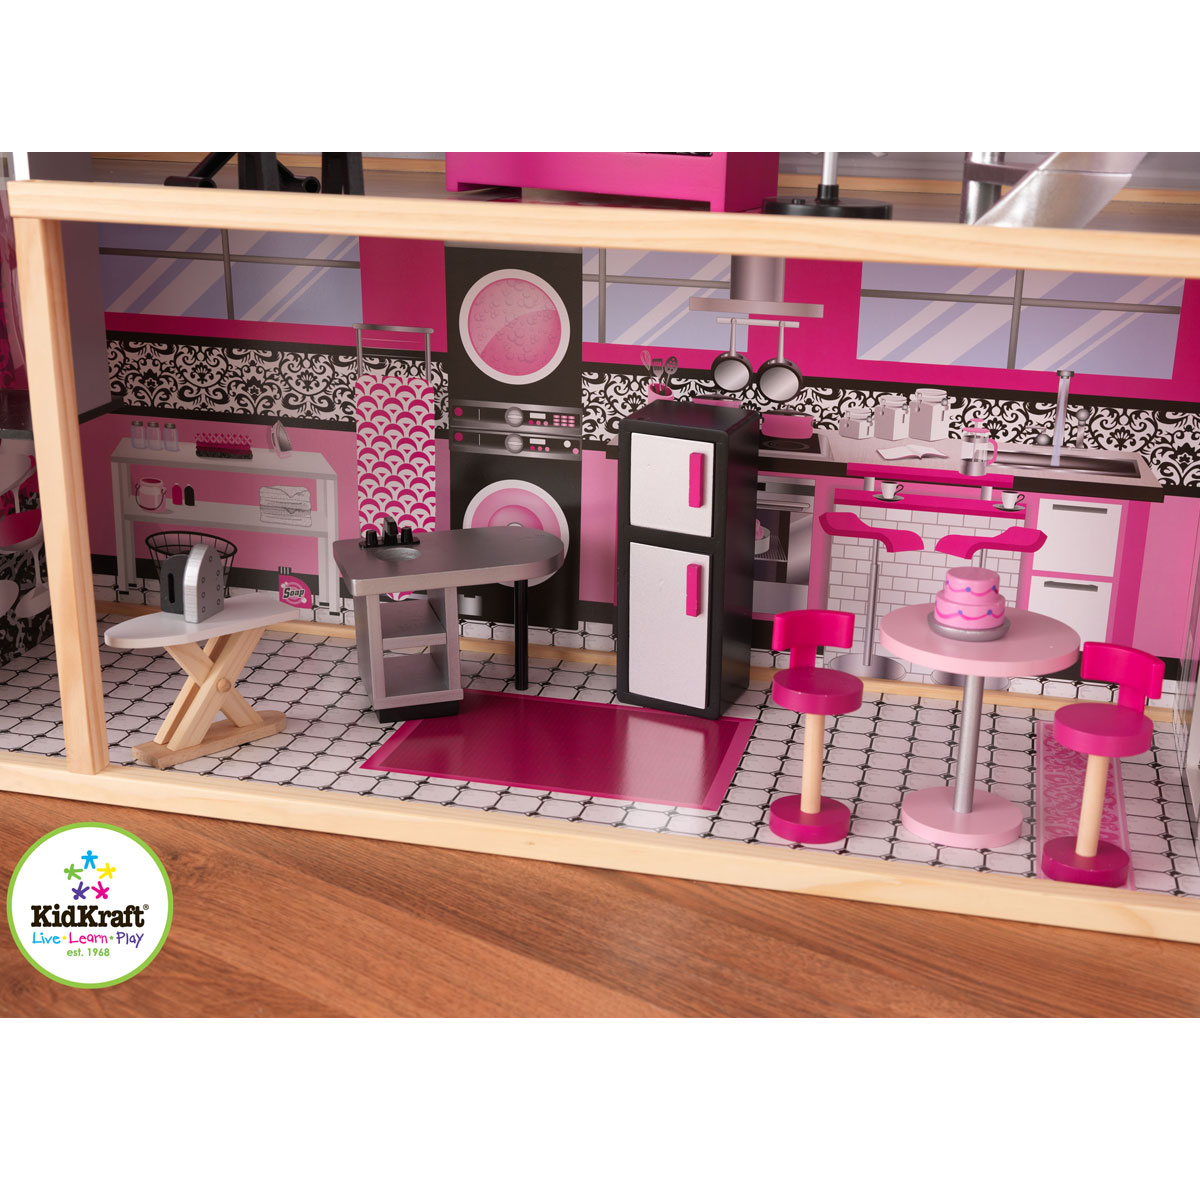 kidkraft puppenhaus glitzer puppen villa aus holz 65826. Black Bedroom Furniture Sets. Home Design Ideas